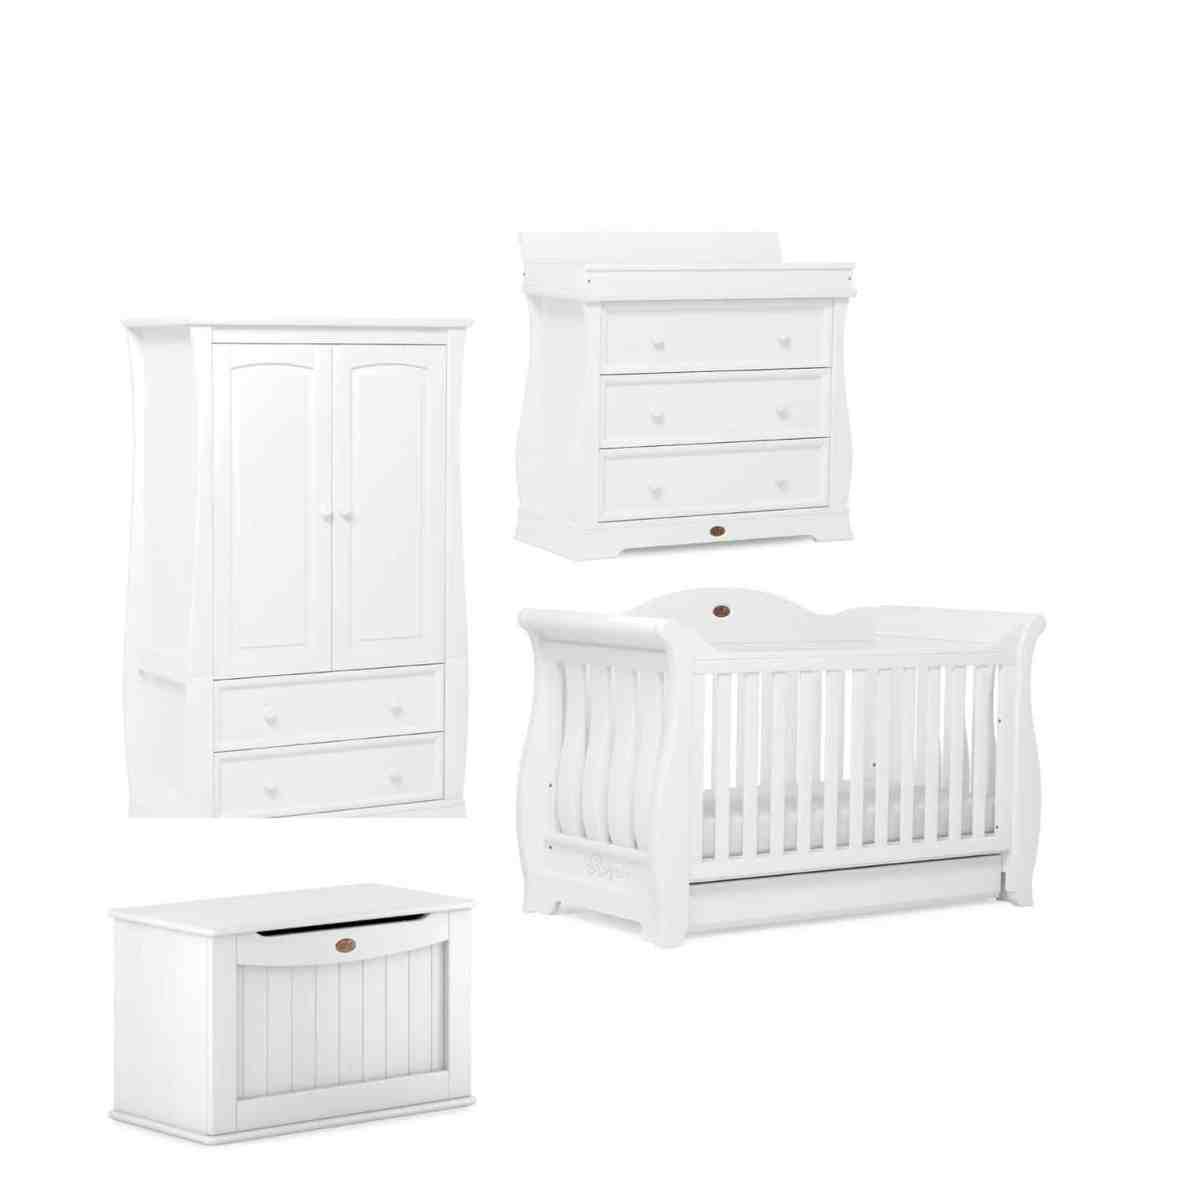 Ex-Display Boori Sleigh Royale 4 Piece Set (Inc Cotbed, Dresser, Wardrobe & Toy Box & Katy Sprung Mattress- White